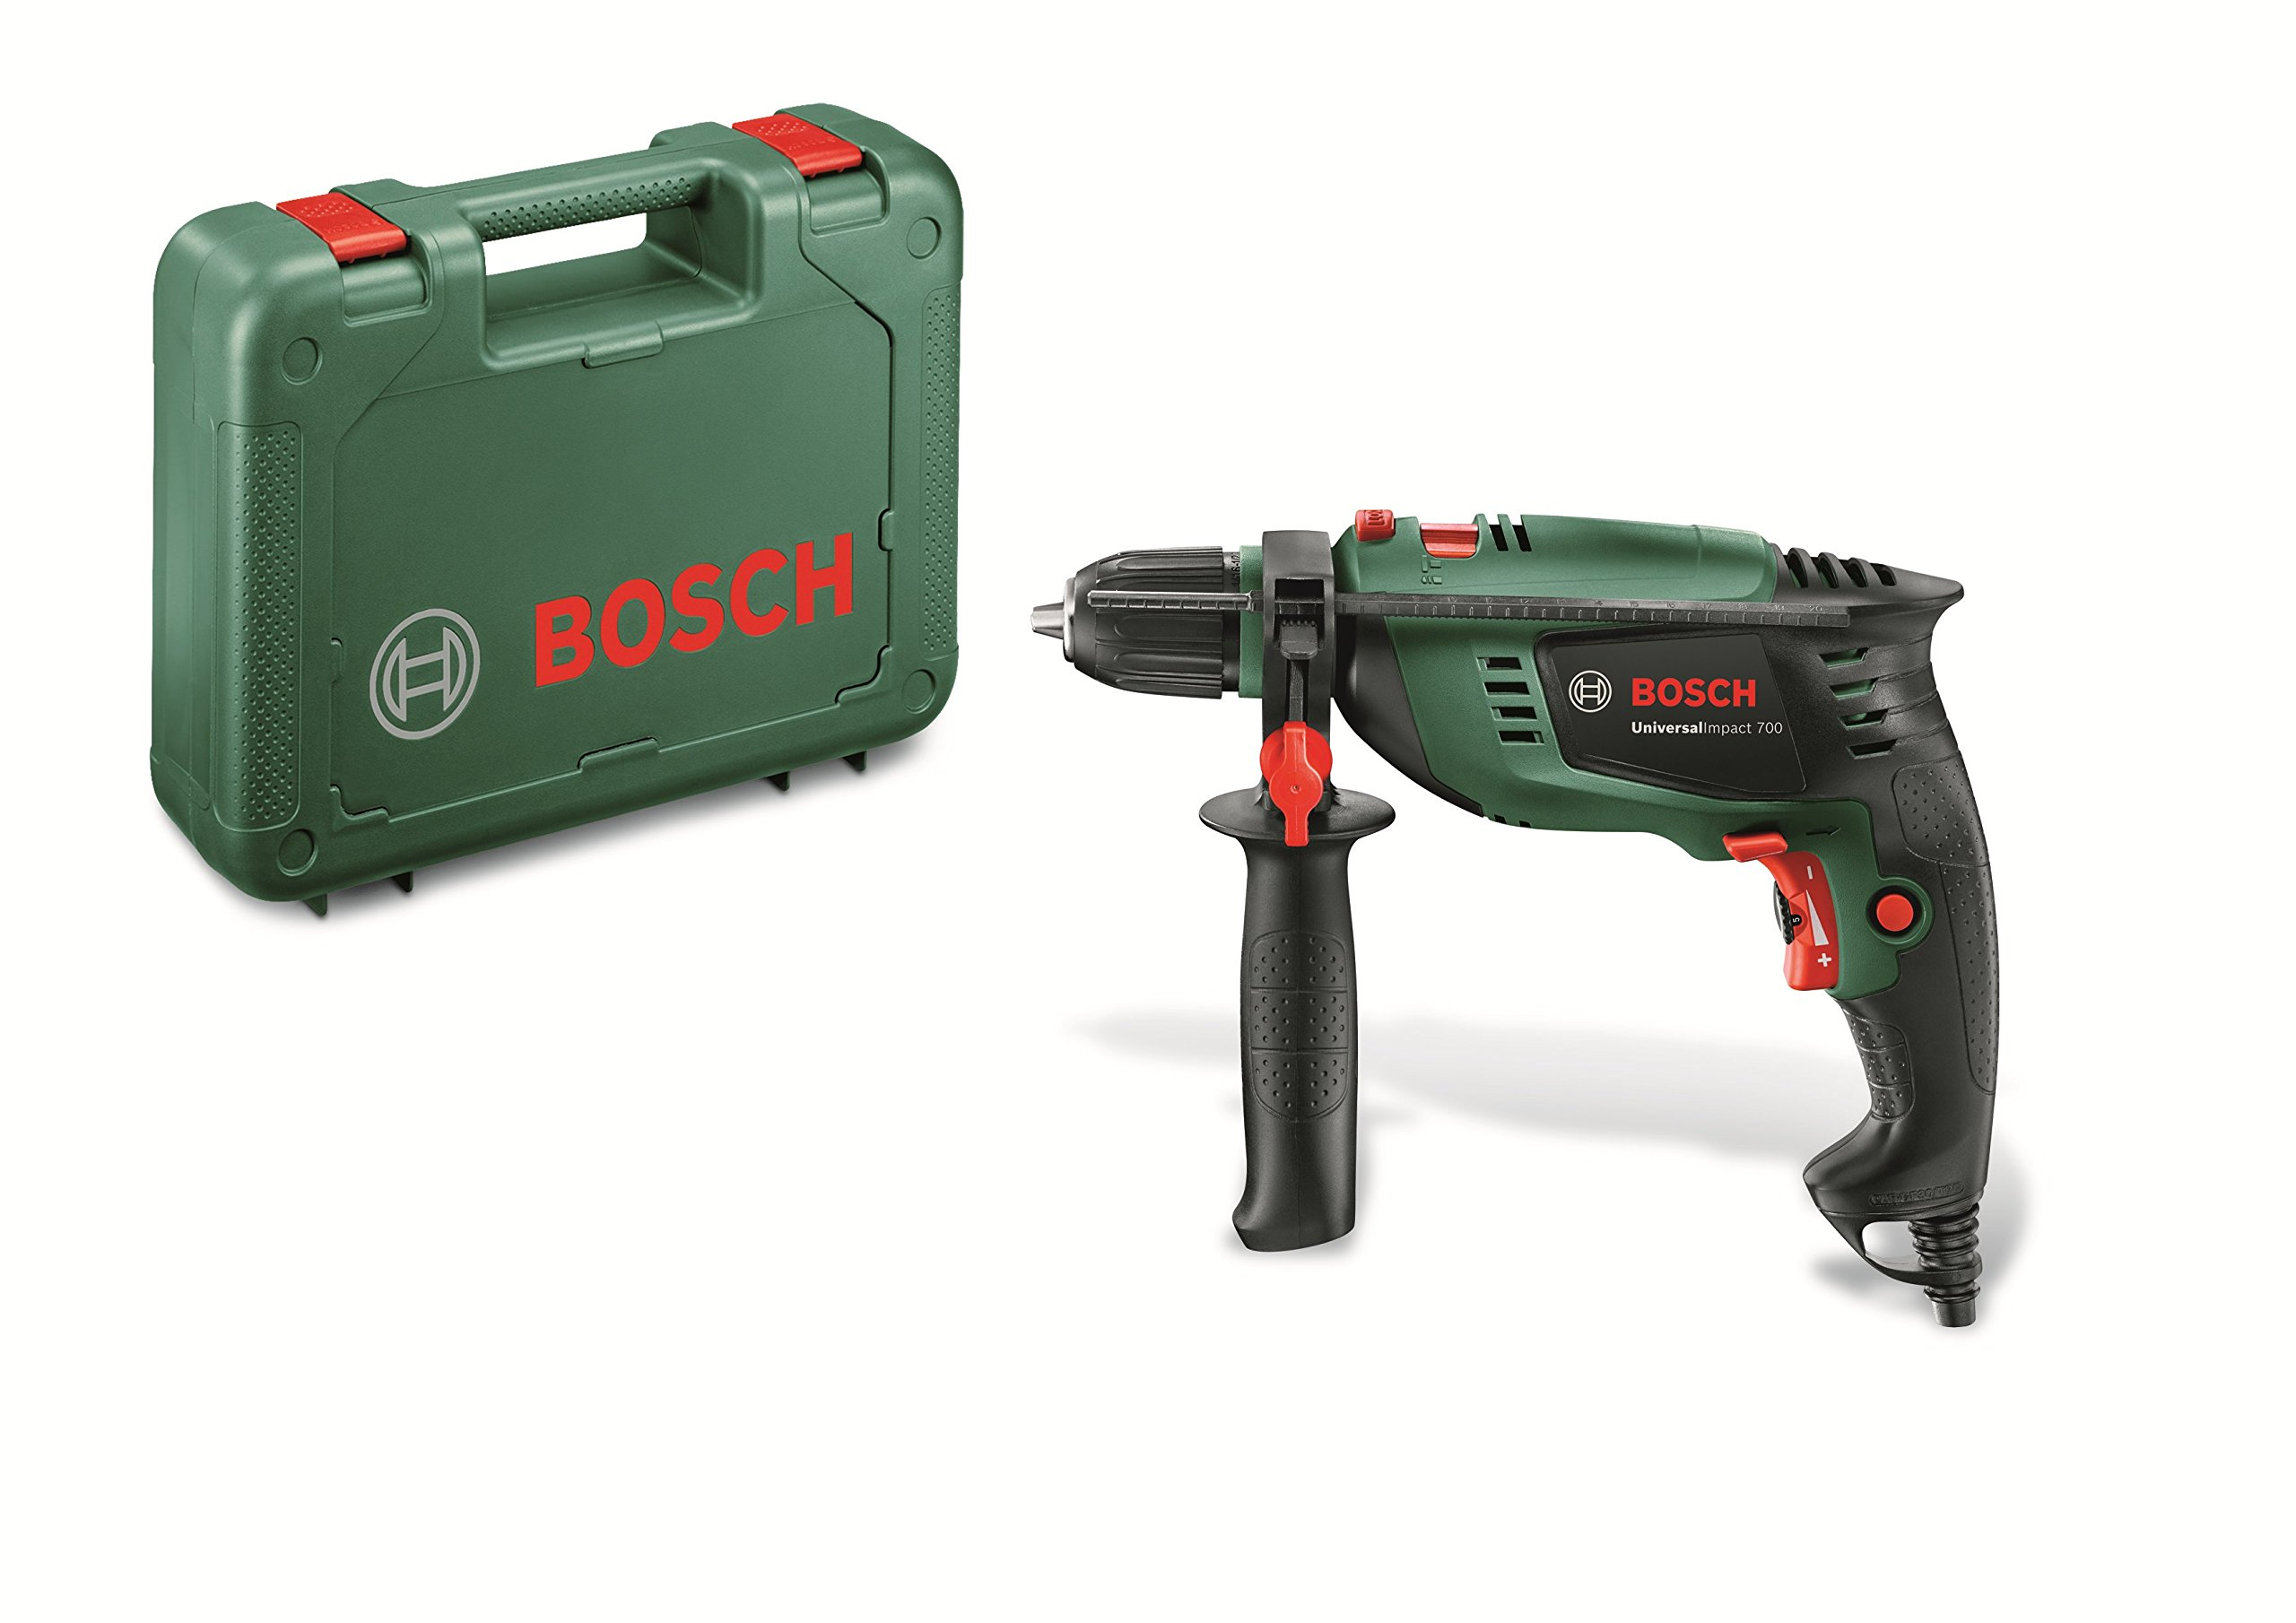 Bosch Universal Impact 700 – Taladro percutor (700 W)